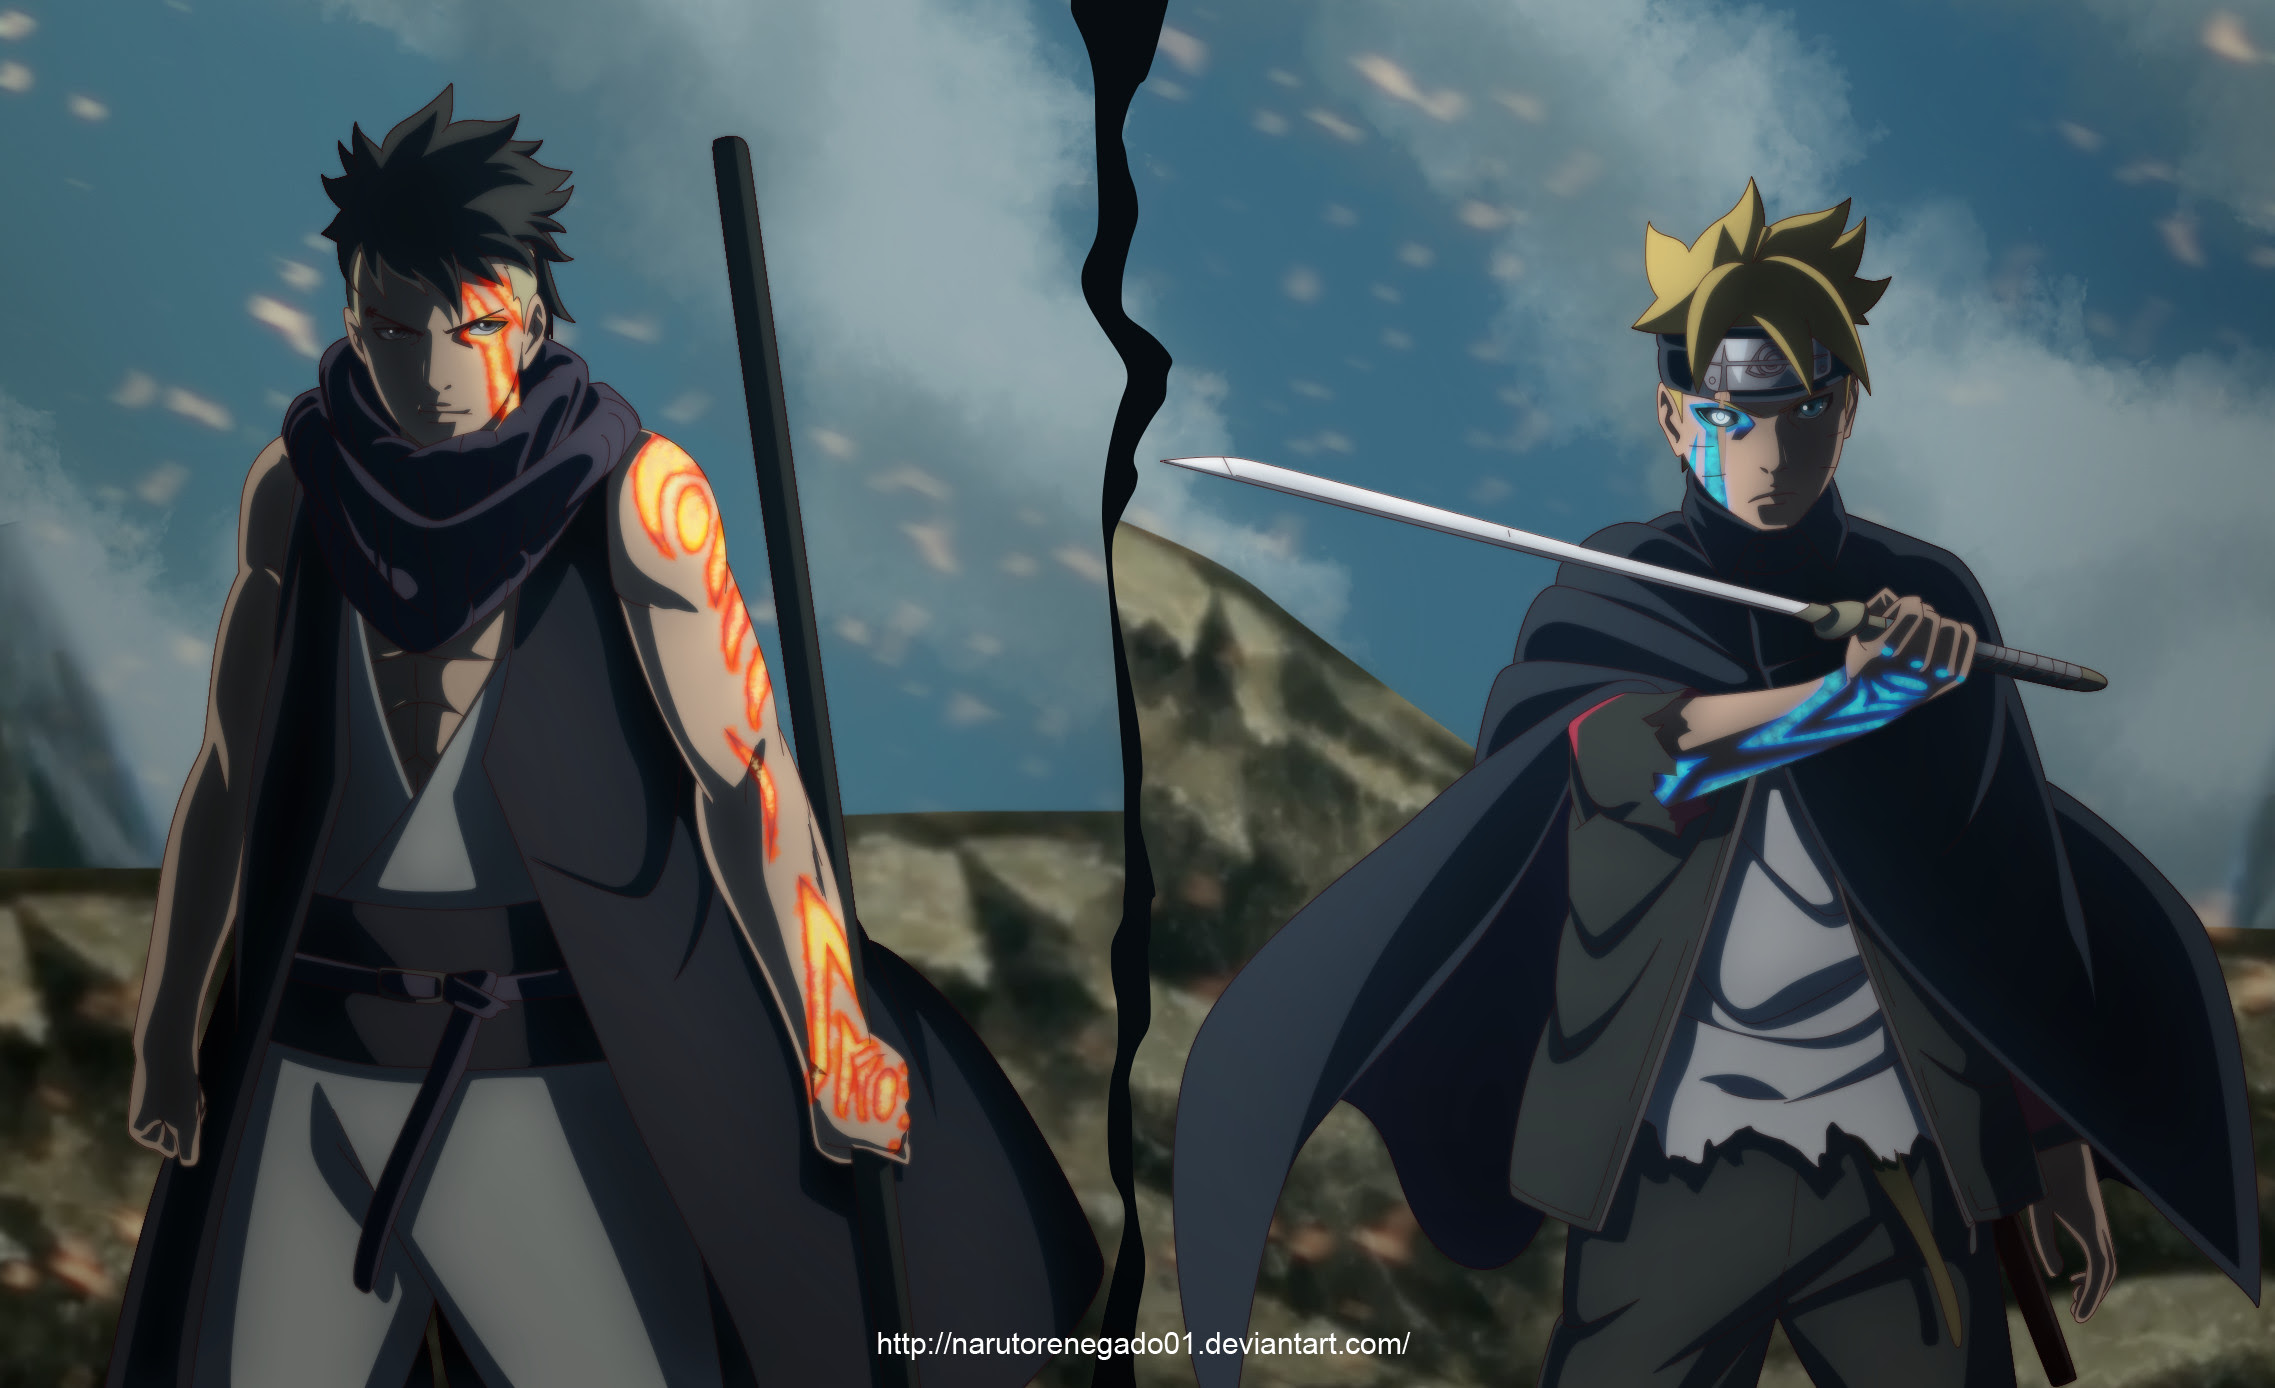 Naruto Wallpaper 4k For Pc Anime Wallpaper Hd